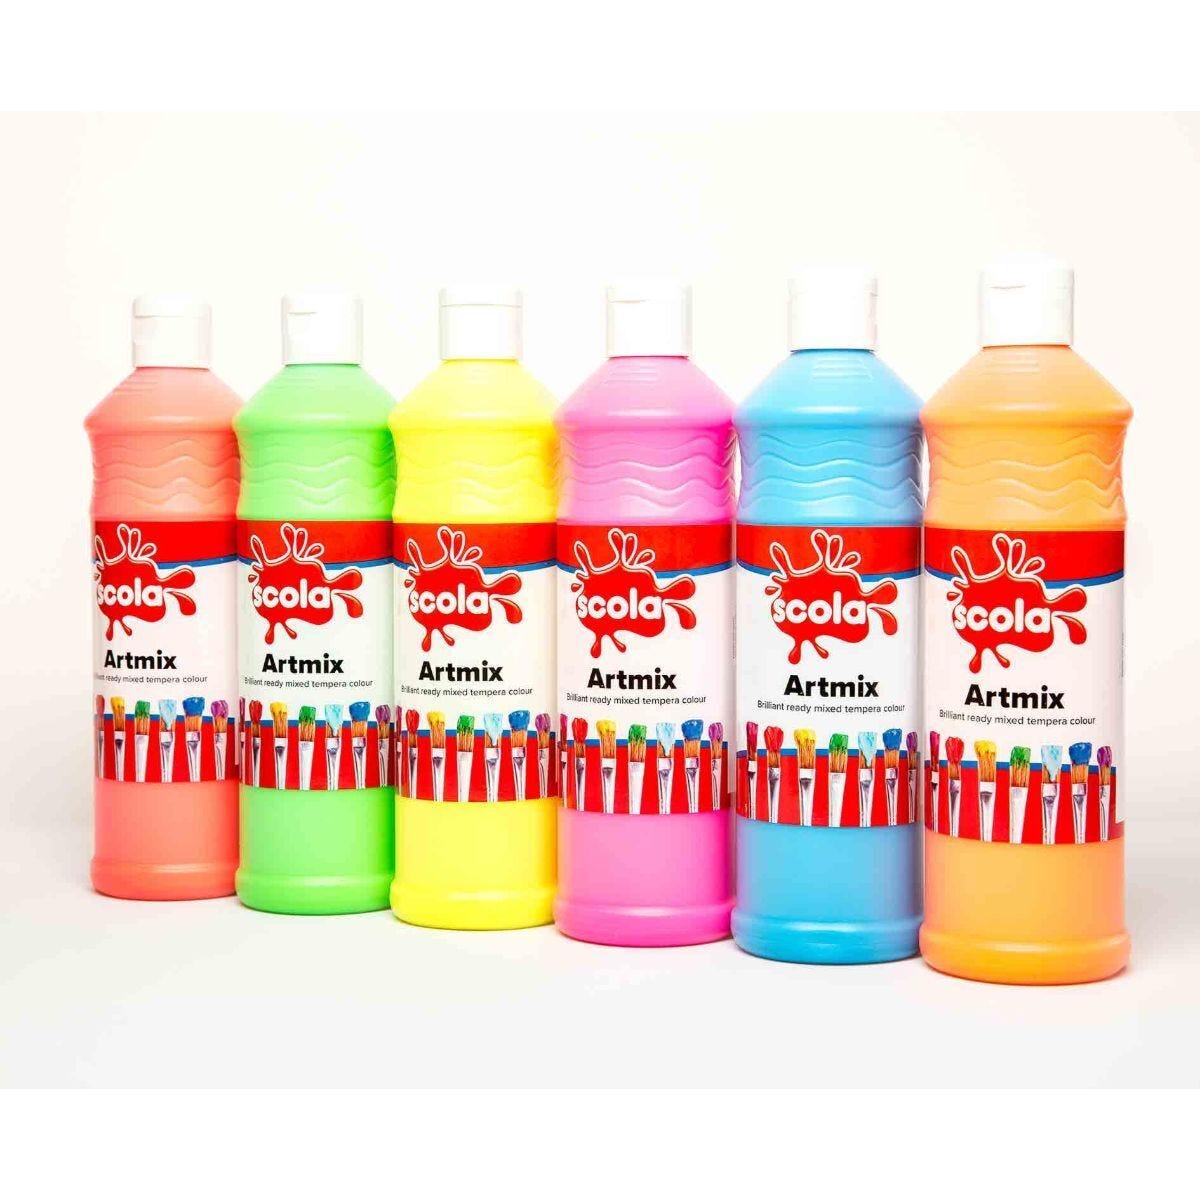 Artmix Ready Mix Paint 6 x 600ml Assorted Flourescent